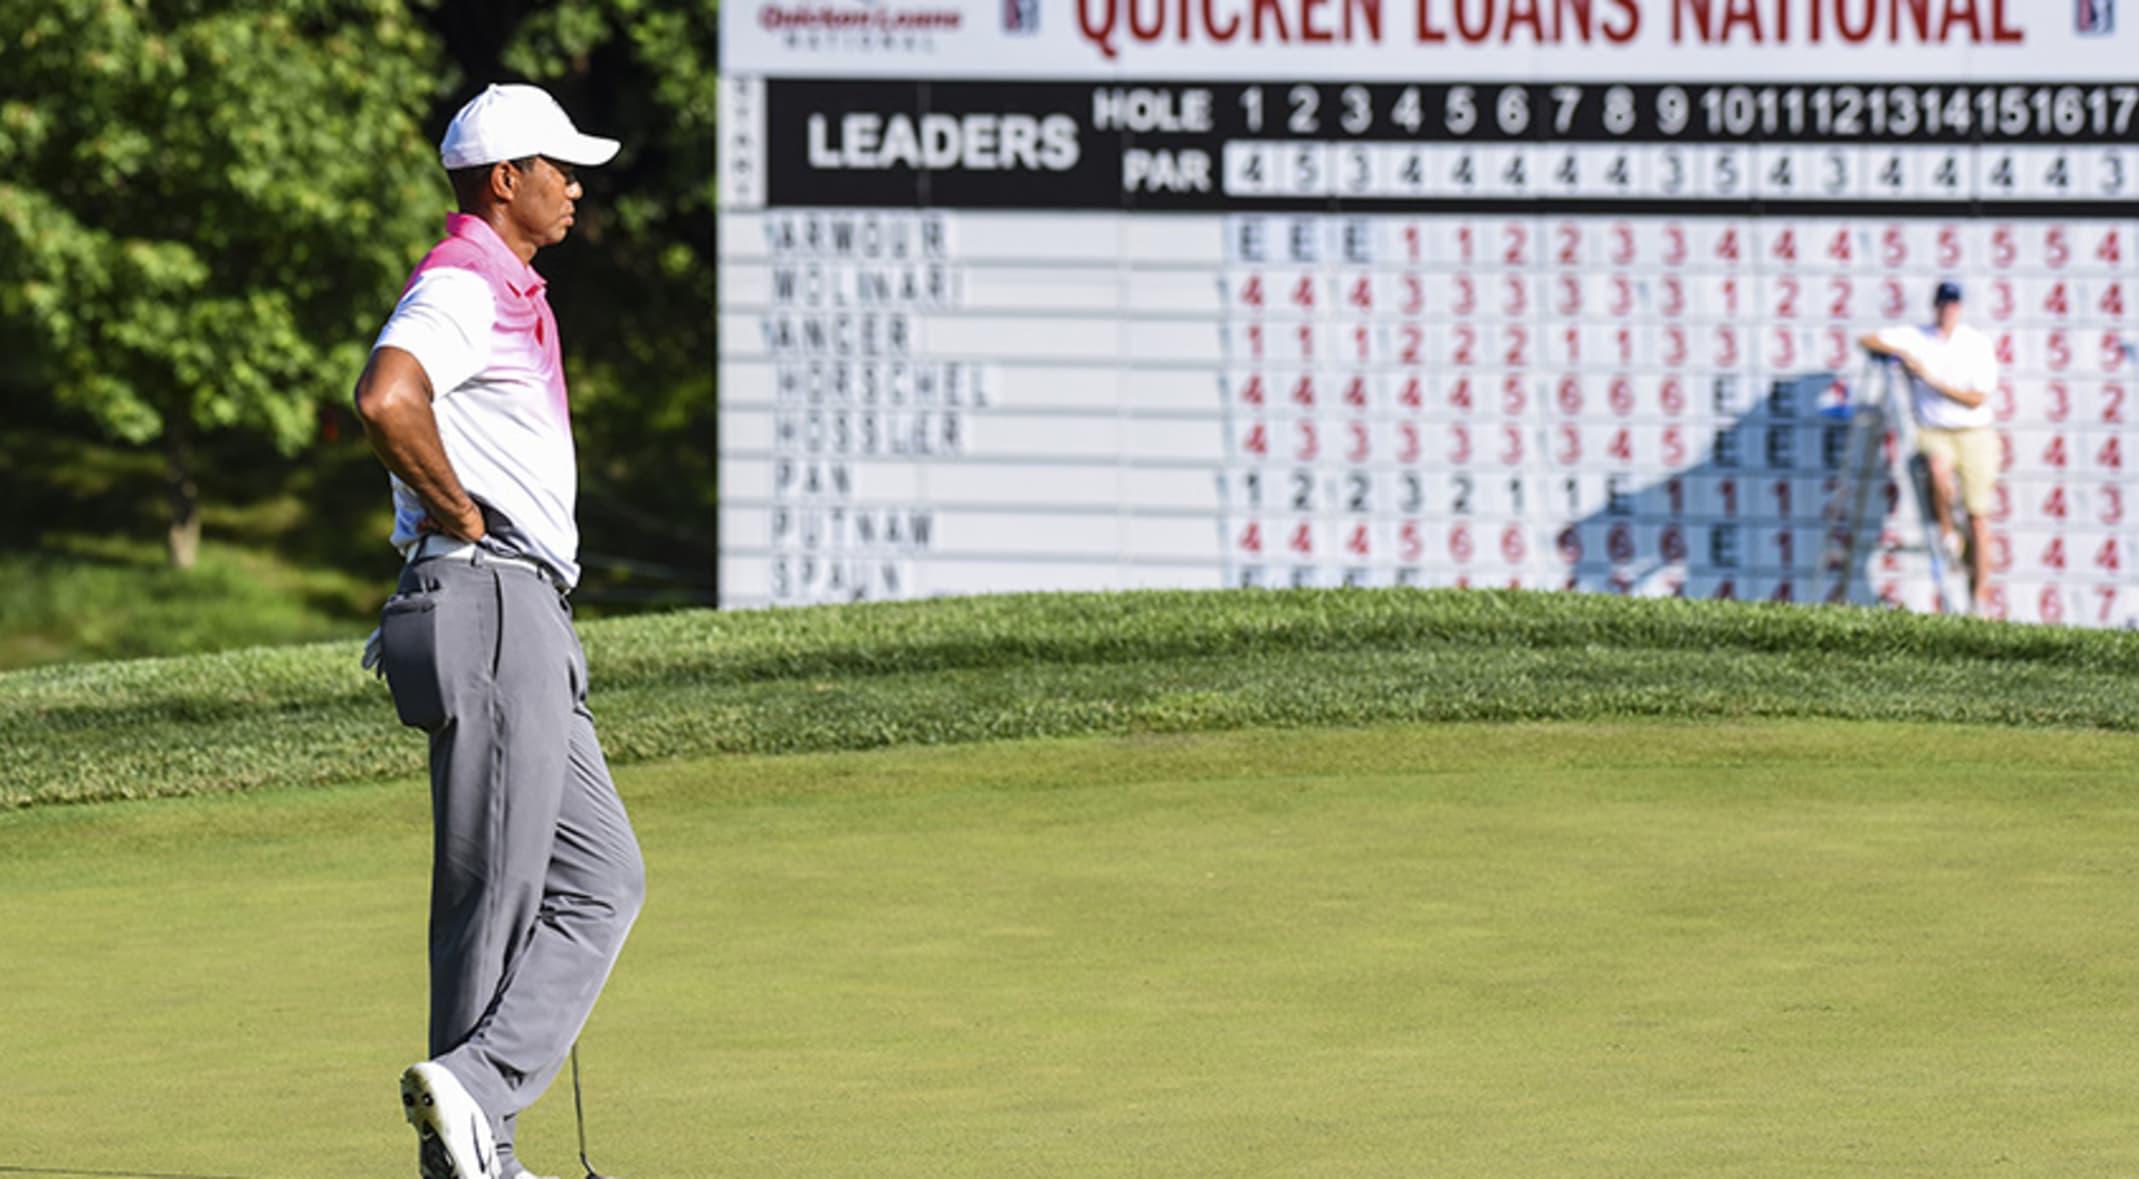 Landry, Spaun lead Quicken Loans National as Woods' putting